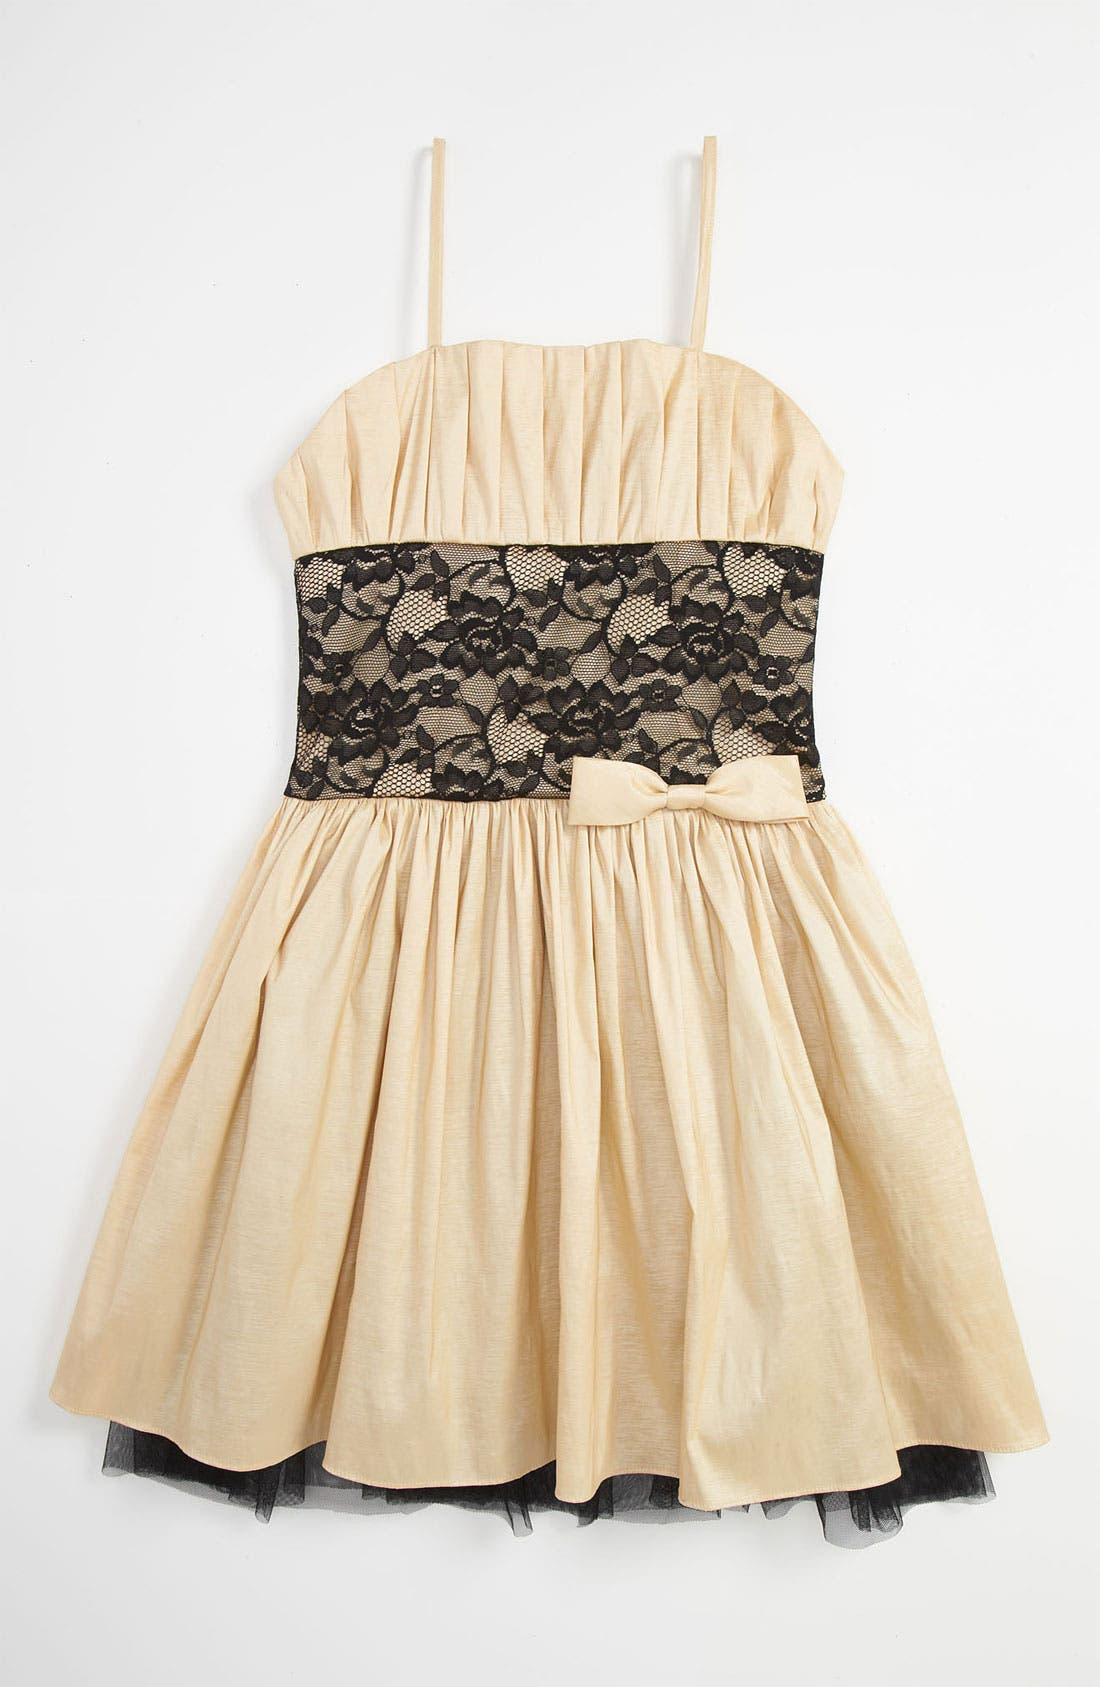 Alternate Image 1 Selected - Jessica McClintock Taffeta Dress (Big Girls)